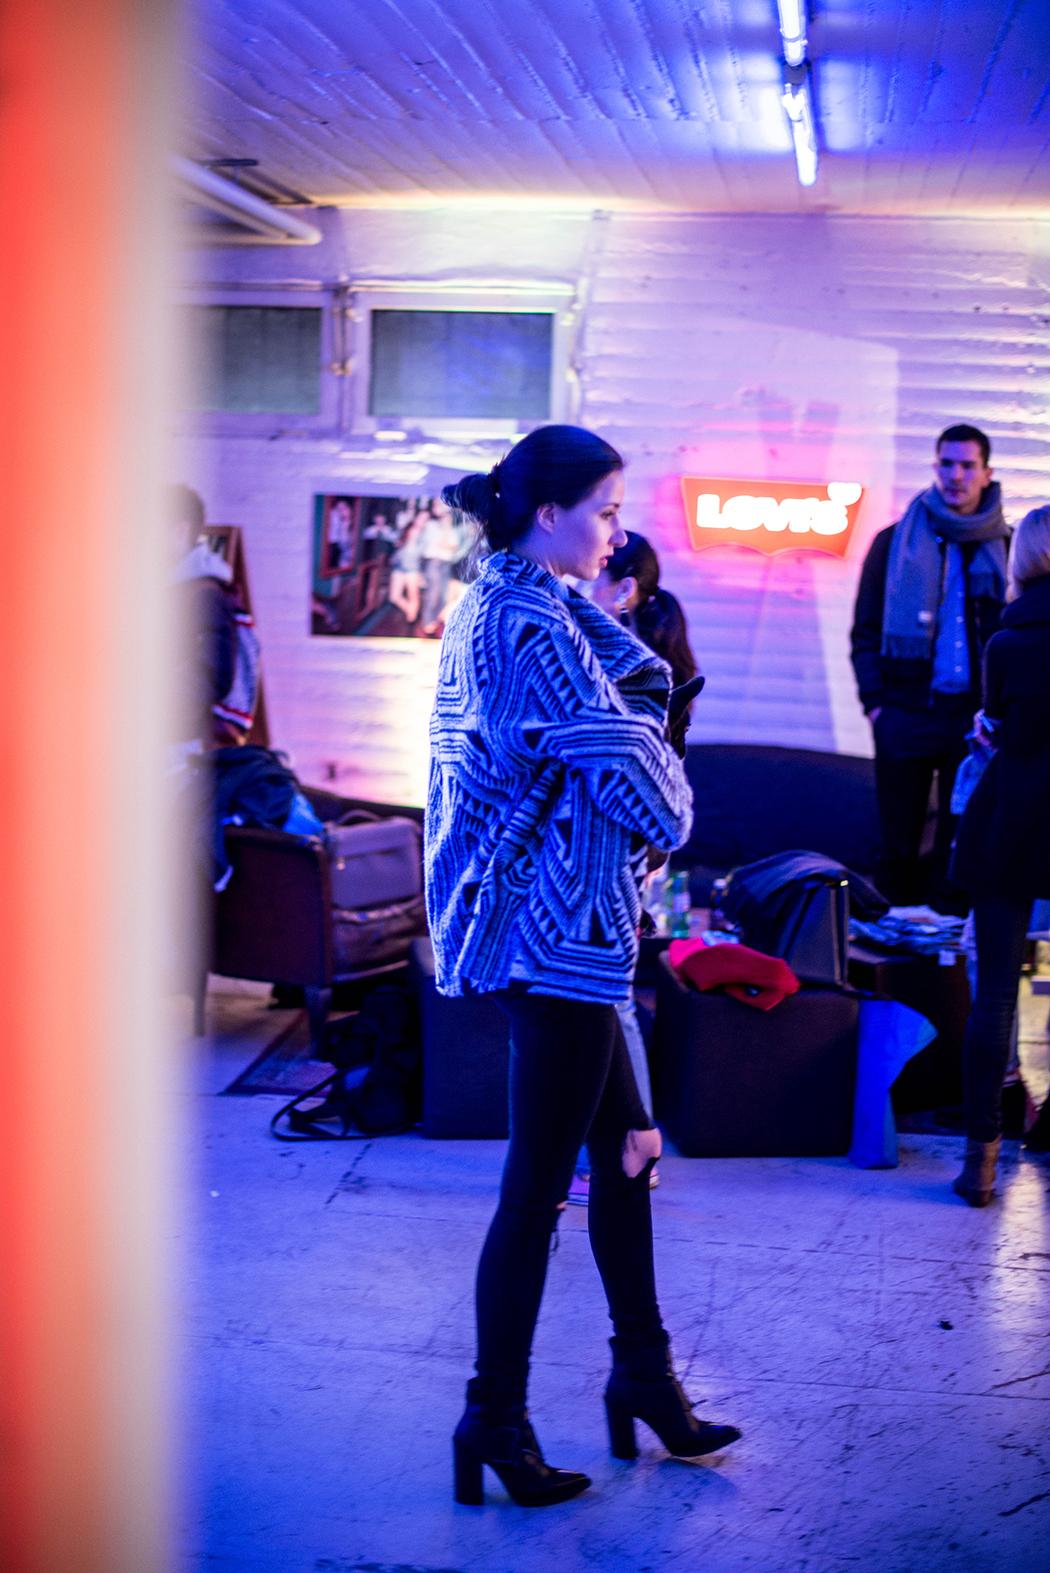 Levis-501-Berlin-Fashionblog-Deutschland-München-Fashionblogger-Bloggerevent-Lindarella-2